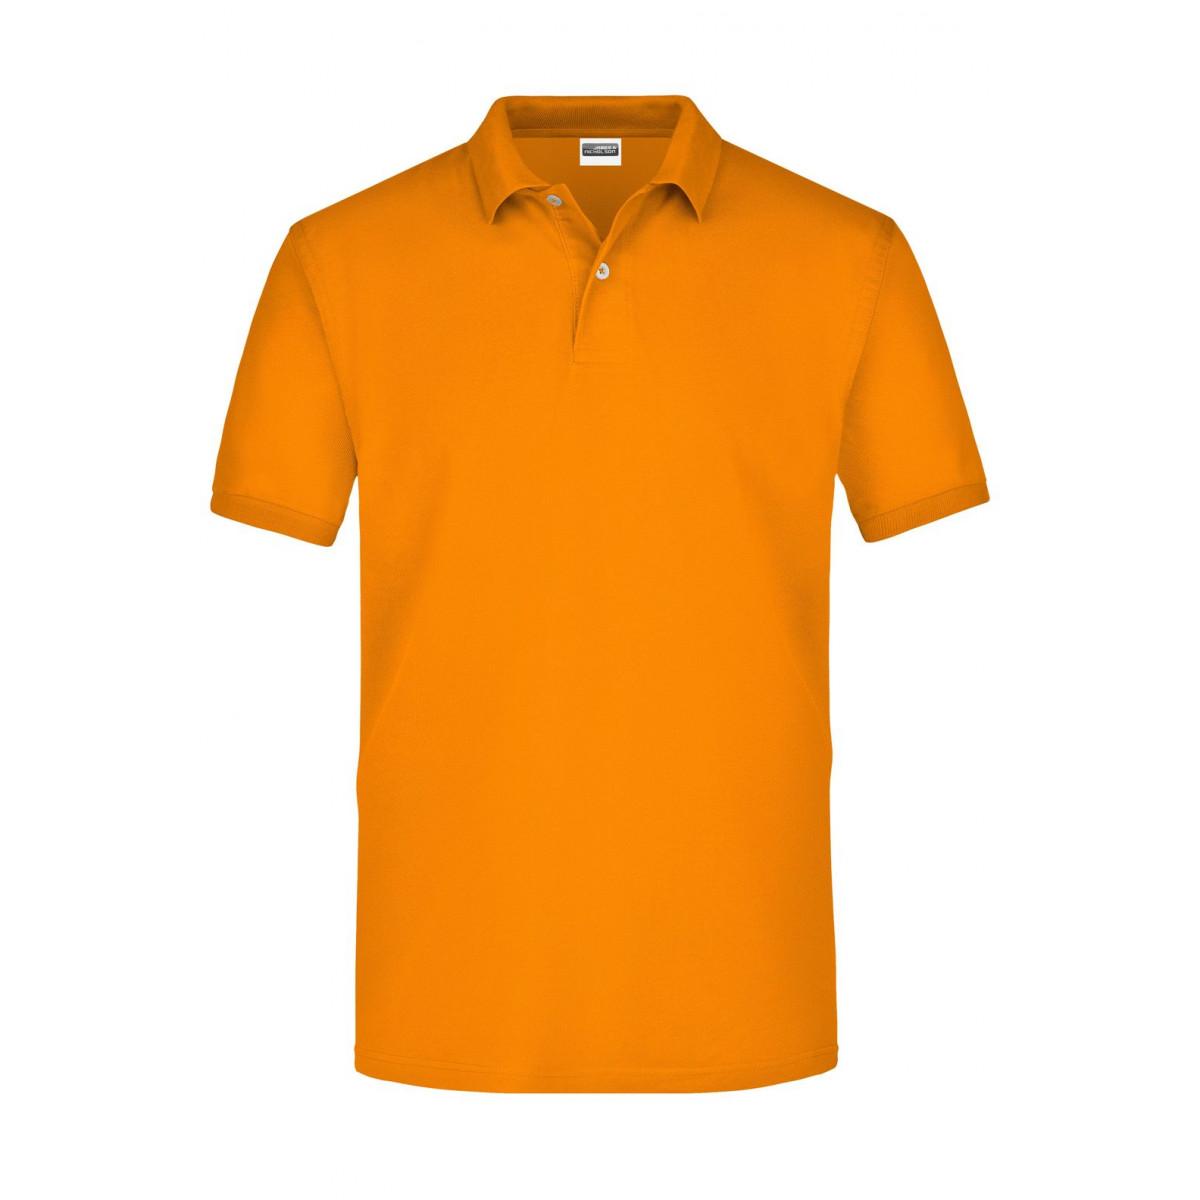 Рубашка поло мужская JN918 Basic Polo - Оранжевый